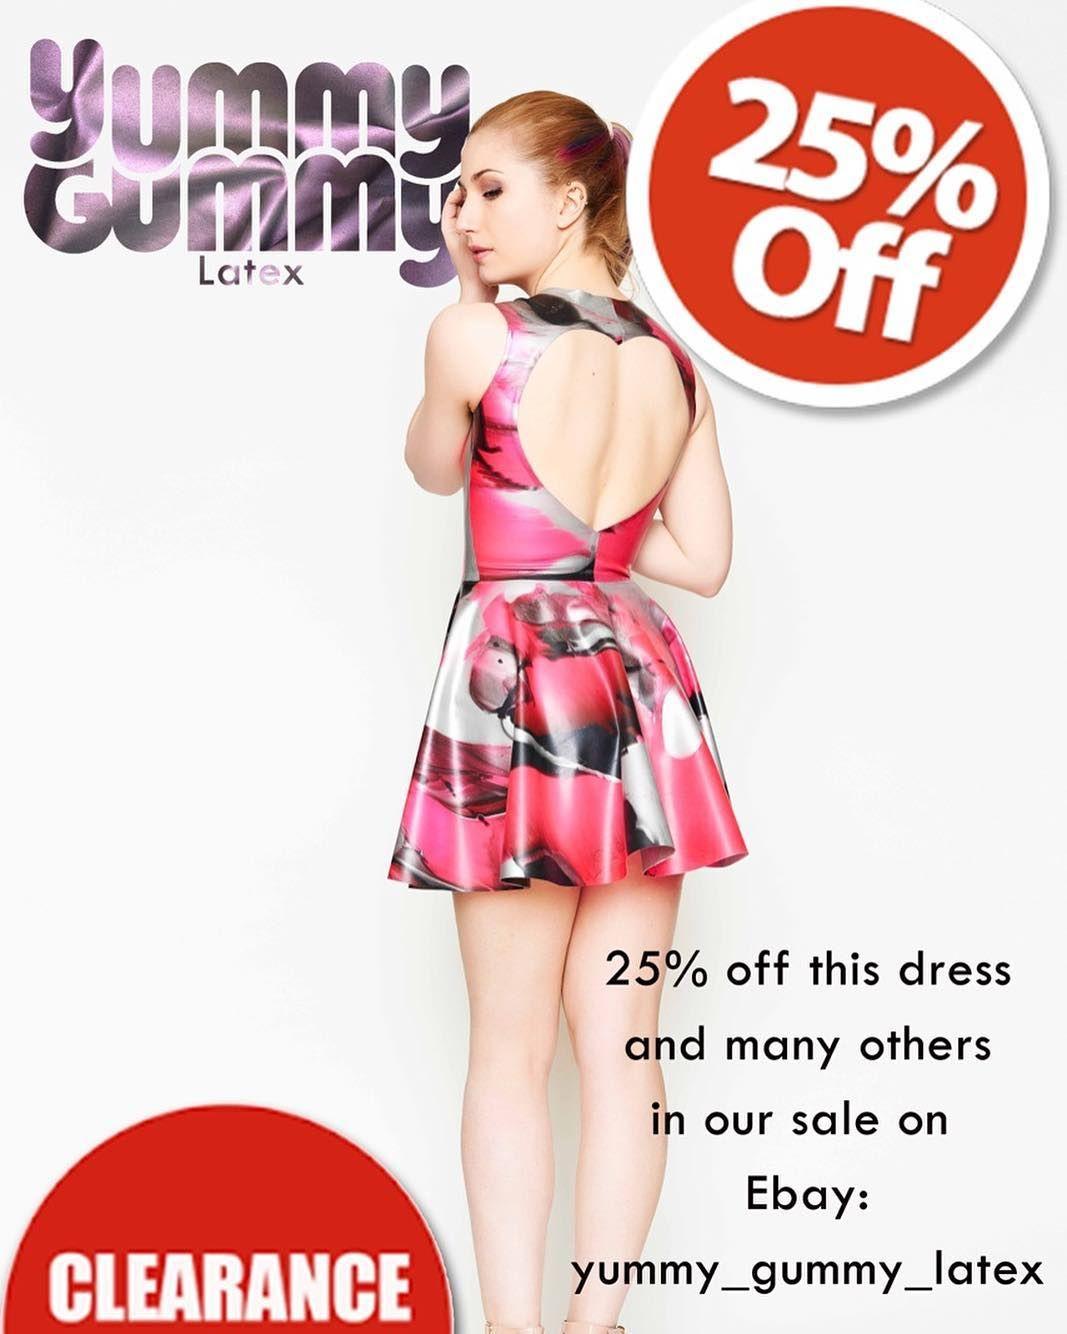 Don't miss out on our sale happening on eBay. Link in bio!! #latex #yummygummylatex #yummygummy #latexfetish #latexfashion #latexdress #openbackdress #sale #25%off